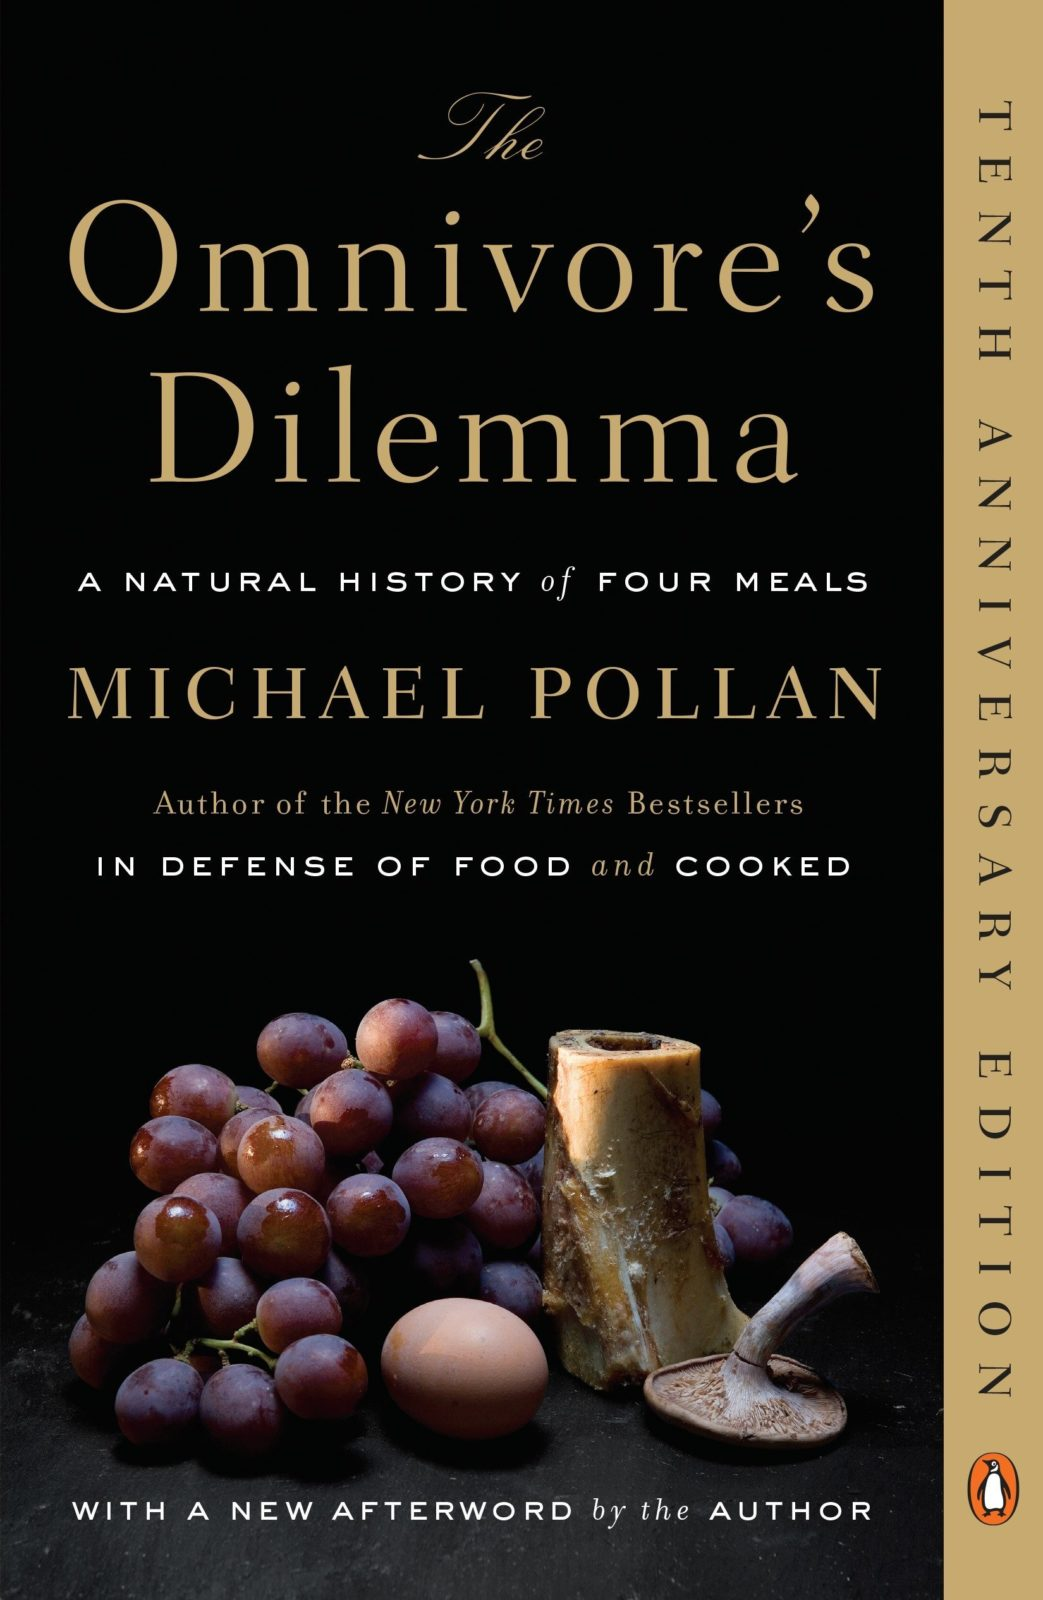 The-Omnivores-Dilemma-1043x1600.jpg